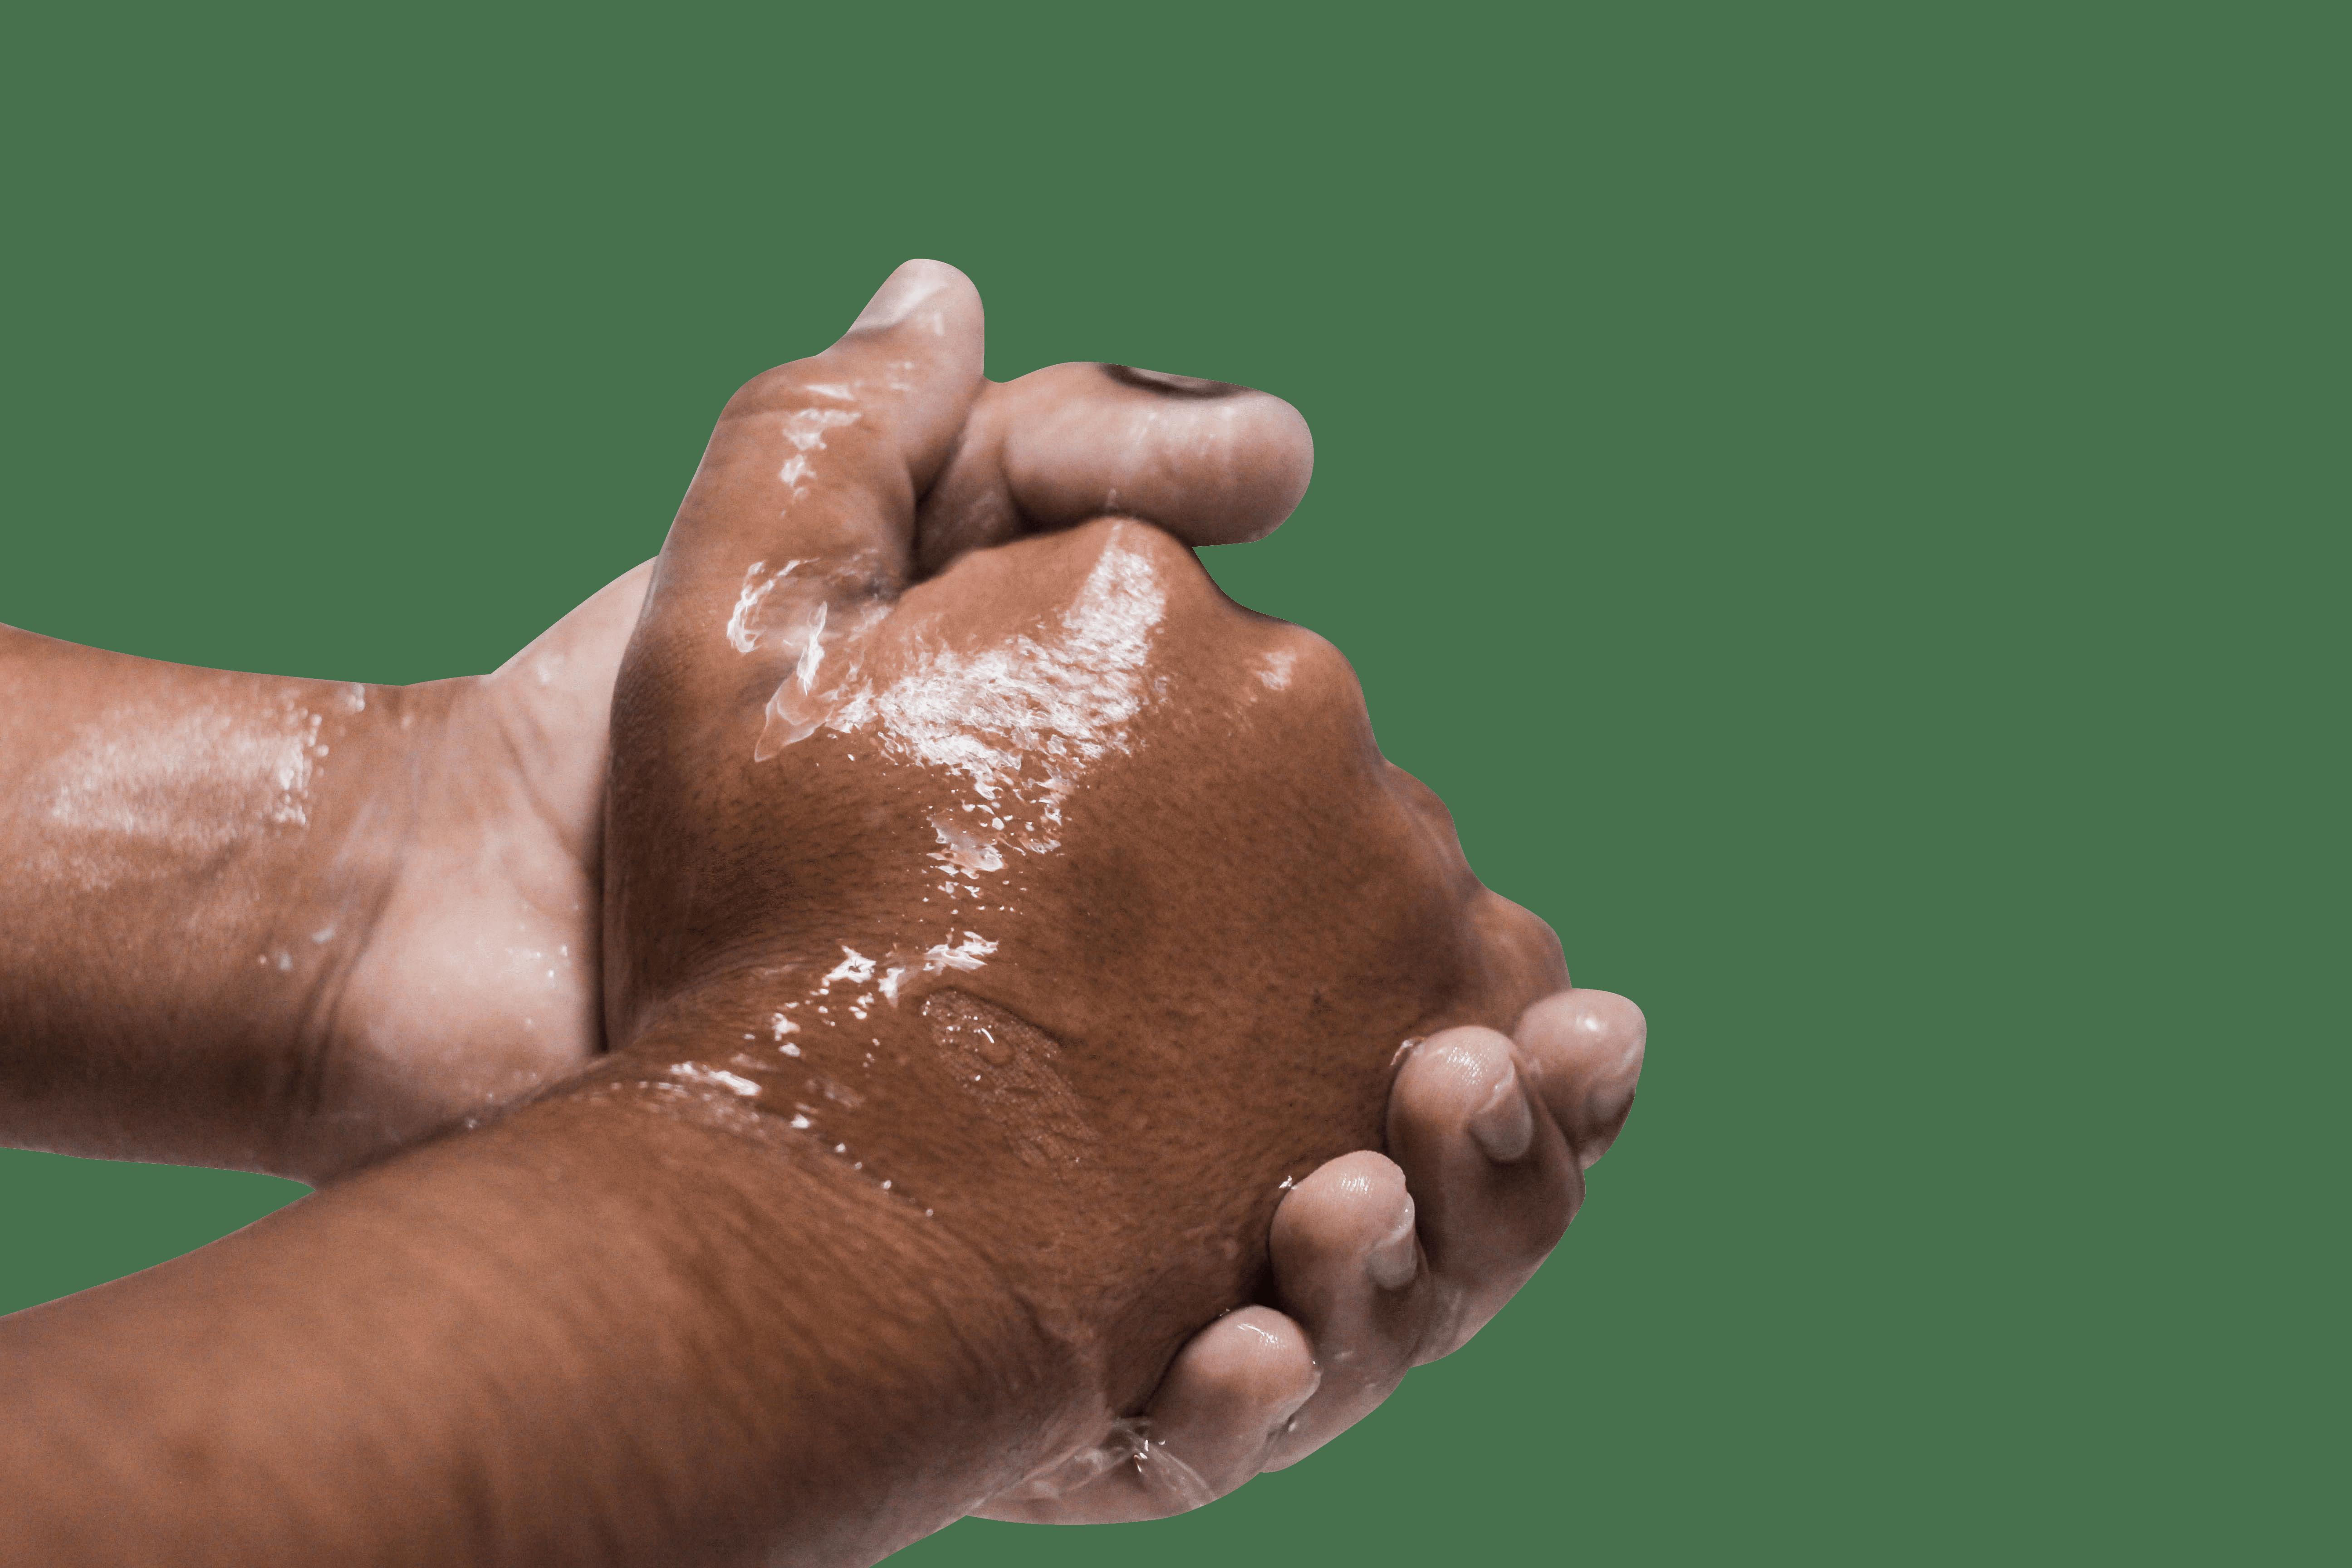 hand wash transparent background.png